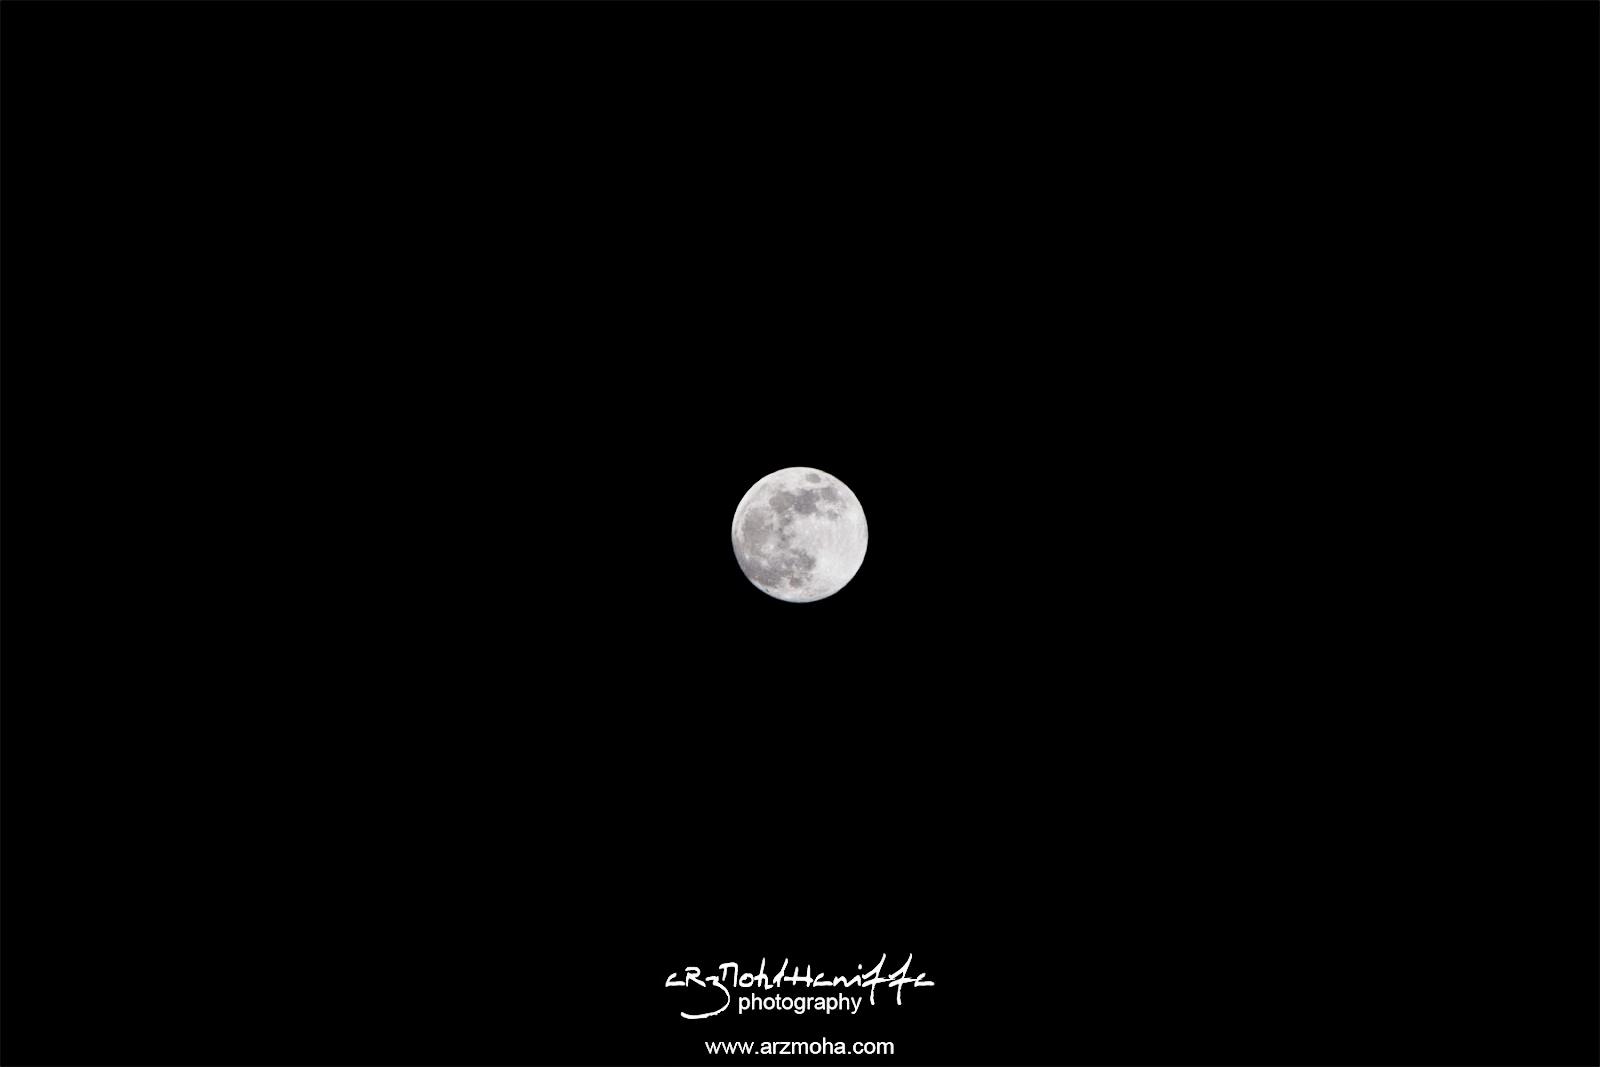 Bulan penuh, full moon, indahnya bulan, jangan jadi seperti bulan, arzmoha.com, gambar cantik, arzmohdhaniffa photography